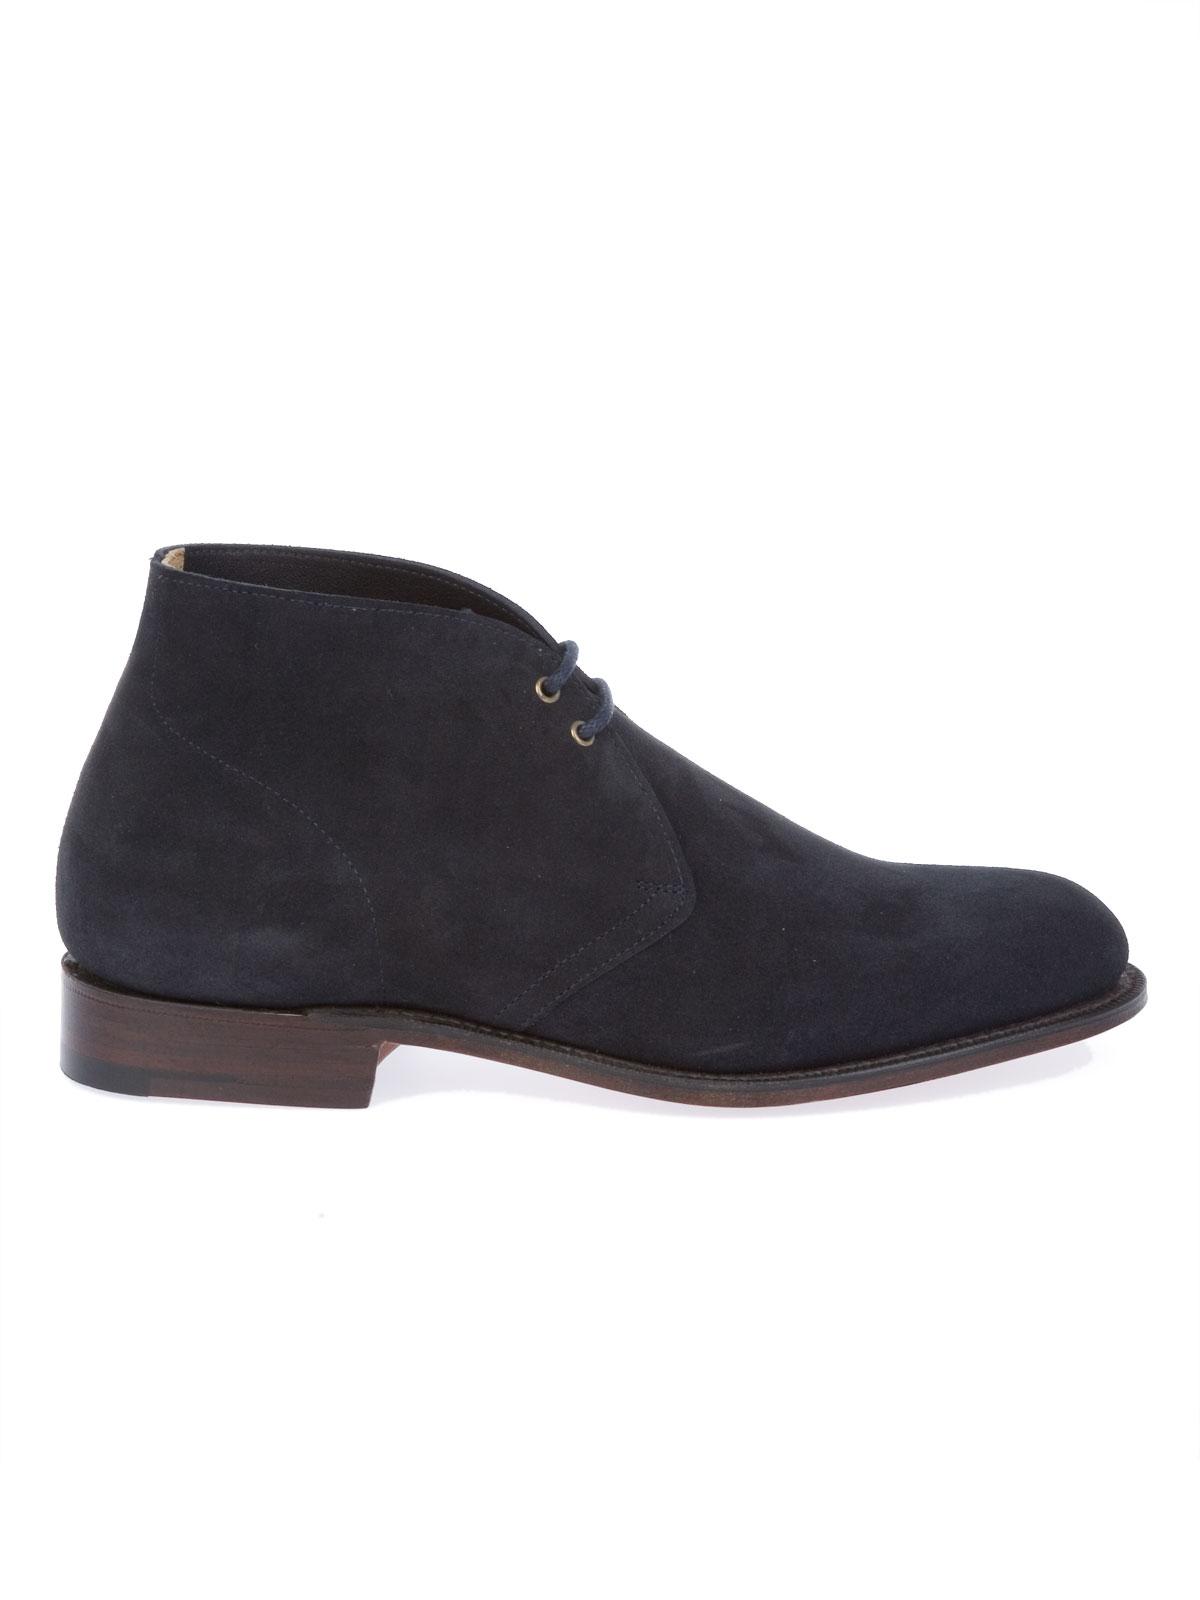 Picture of CHURCH'S | Men's Sahara Shoe